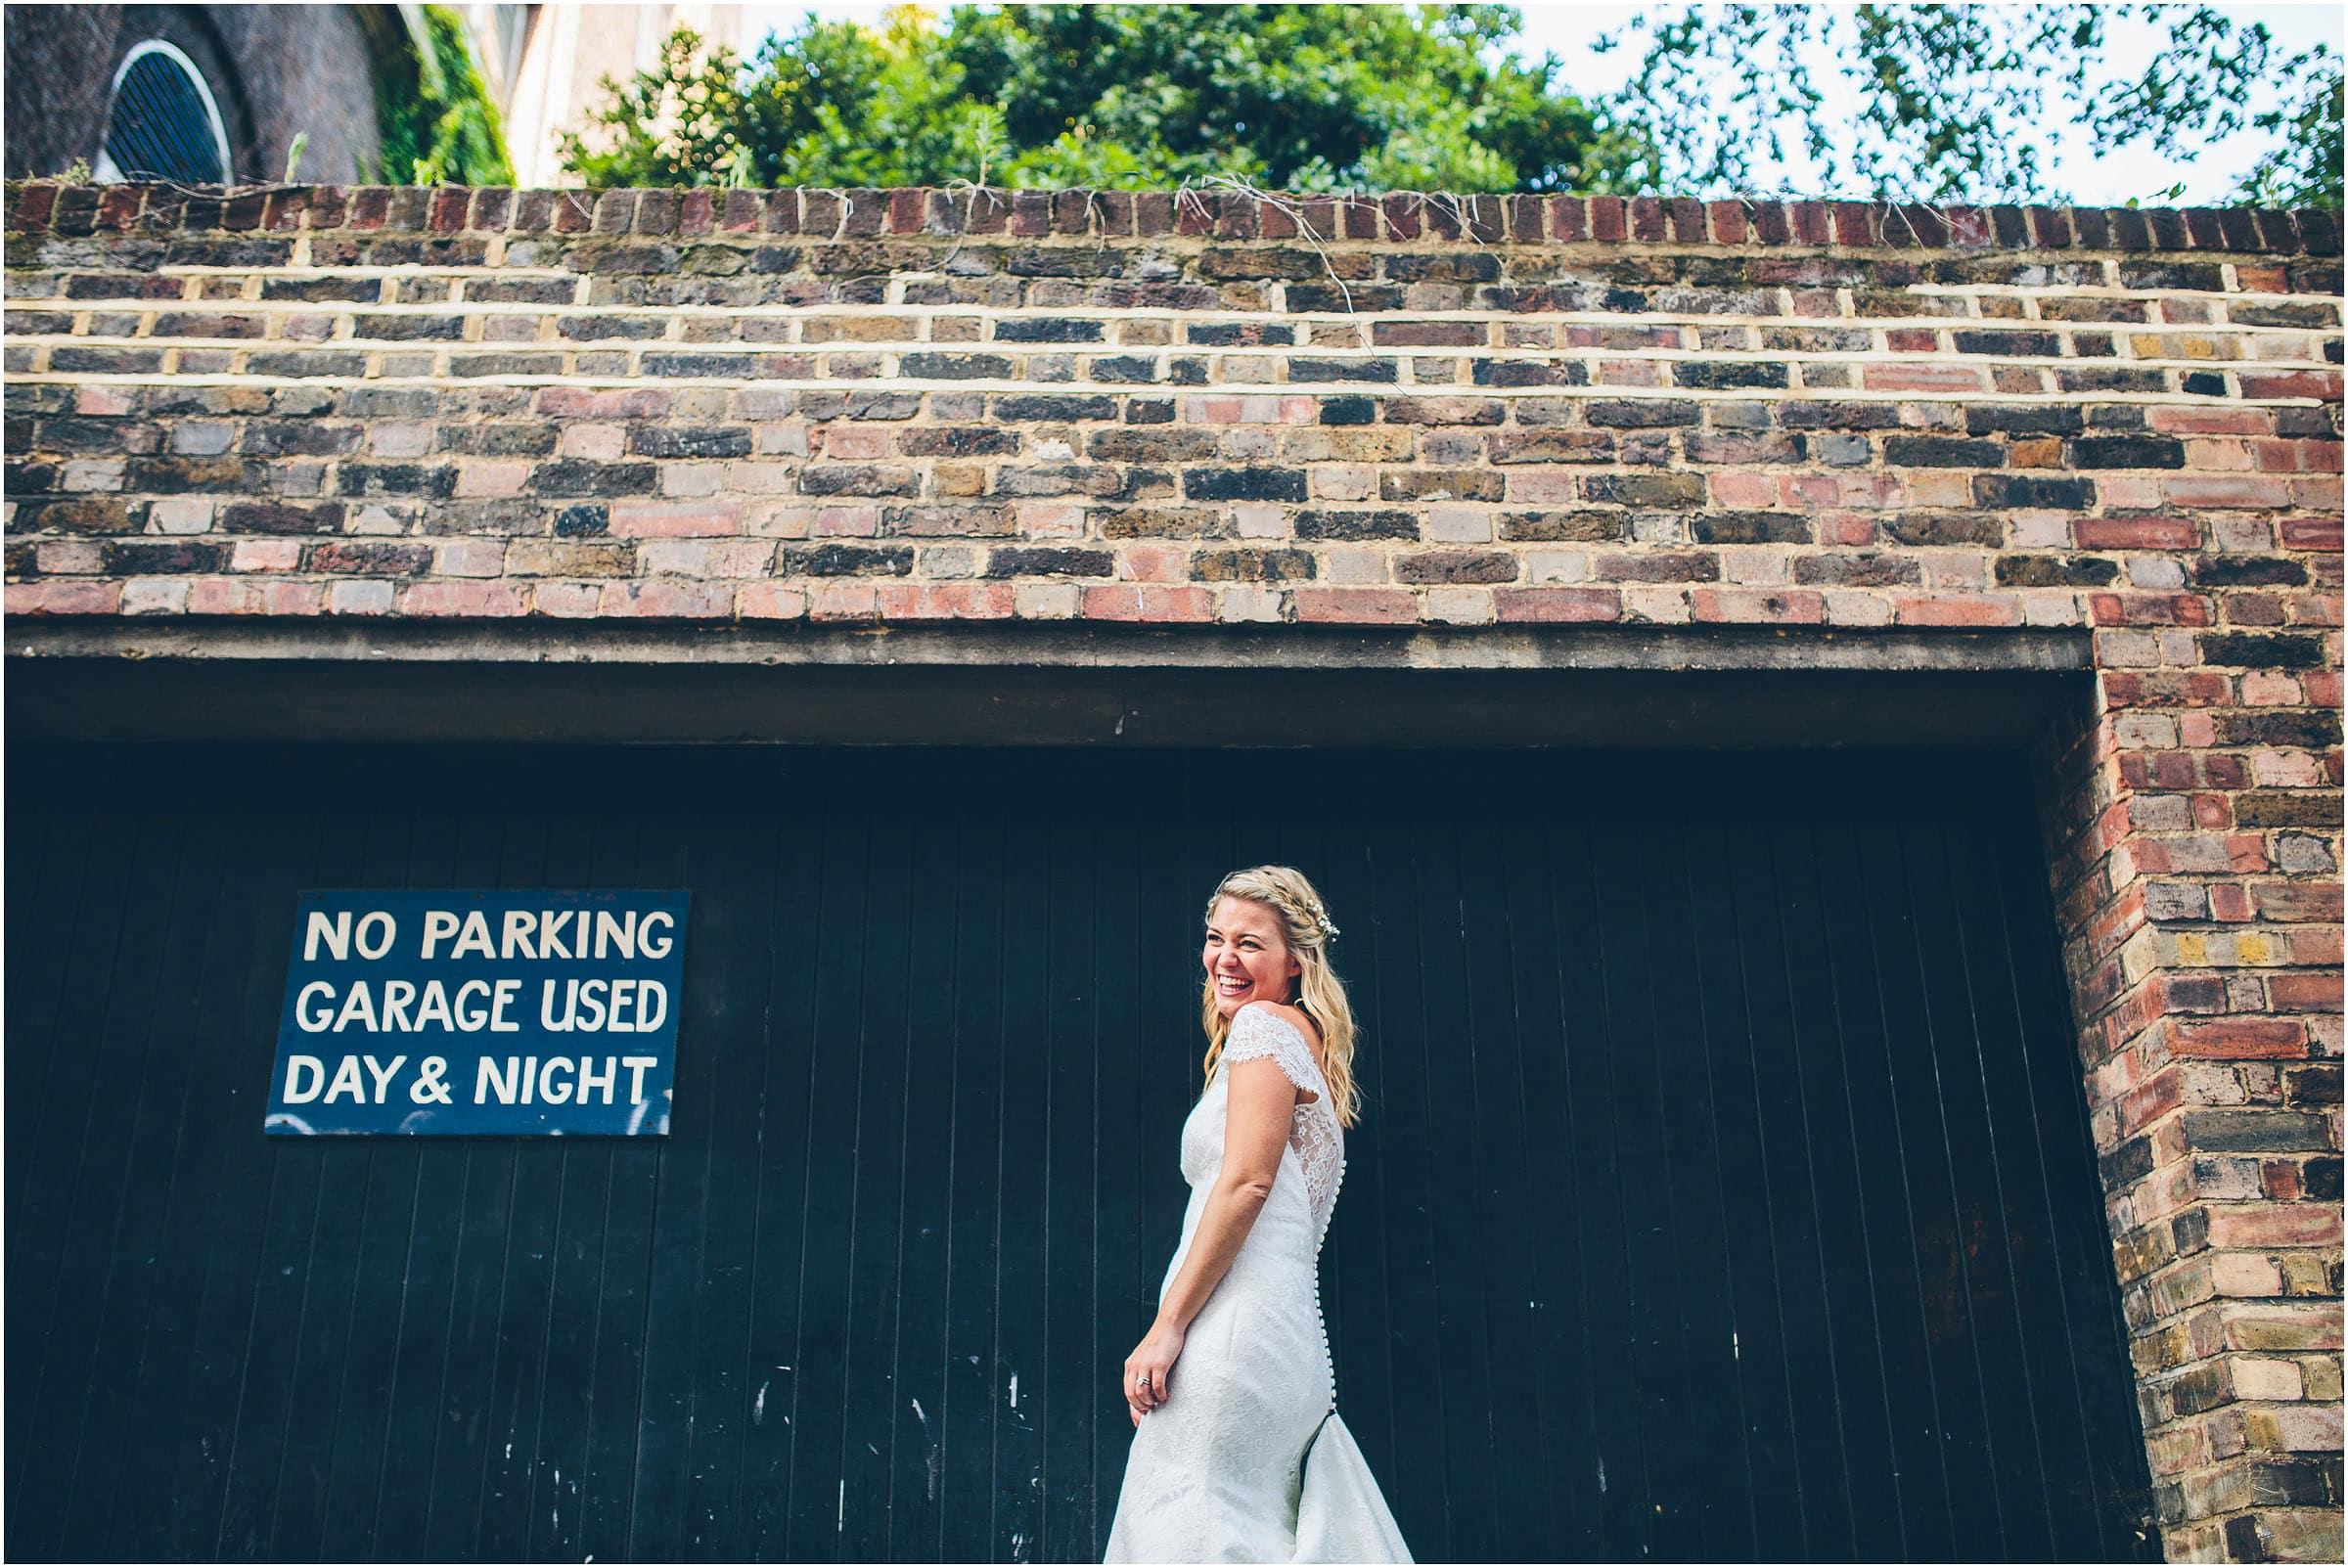 Kensington_Roof_Gardens_Wedding_Photography_0065